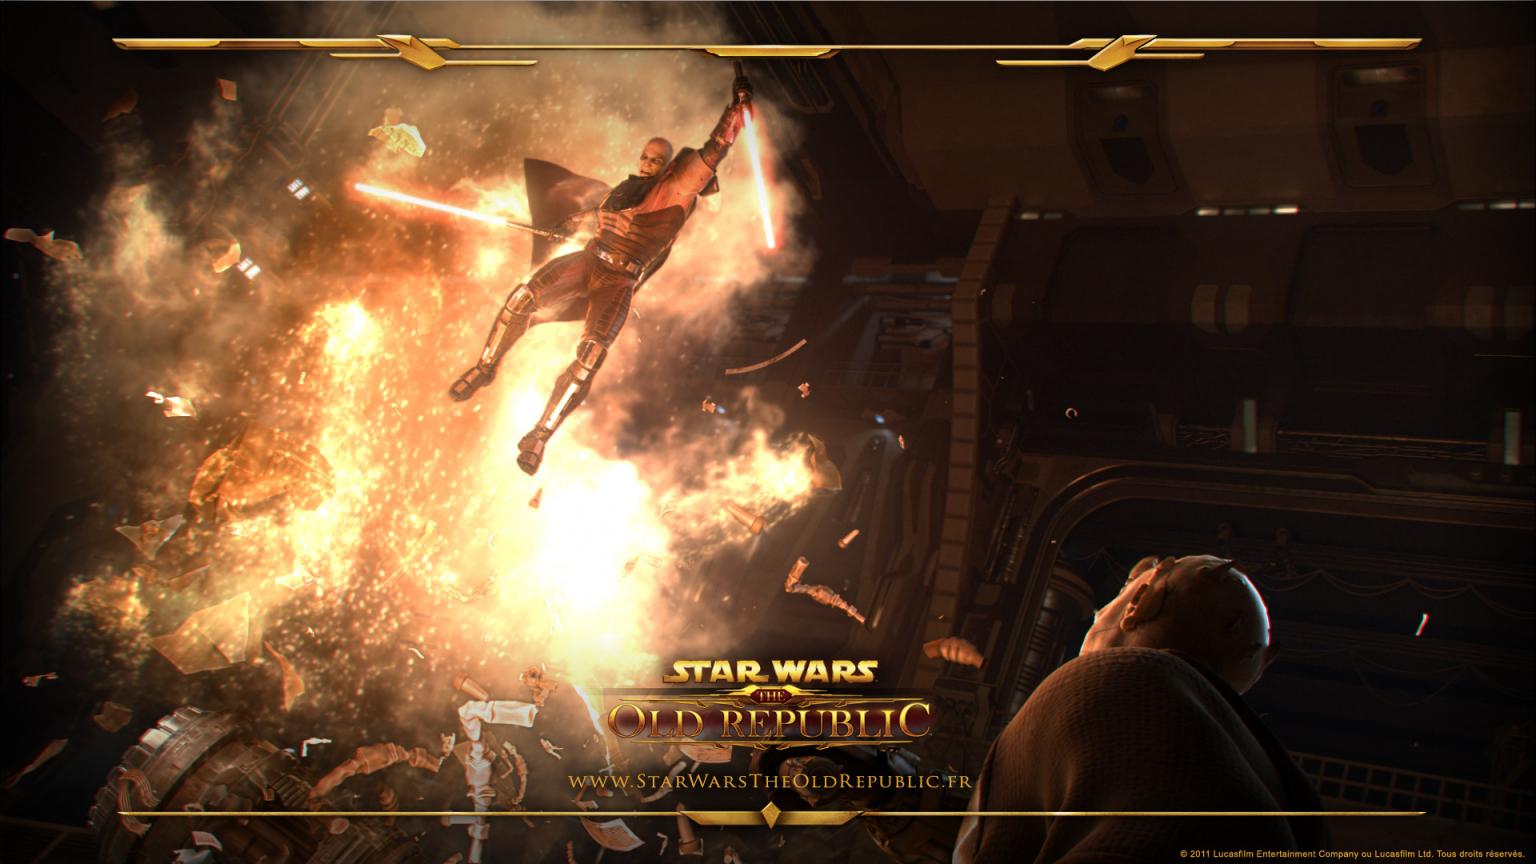 Free Download Star Wars The Old Republic Star Wars Wallpaper